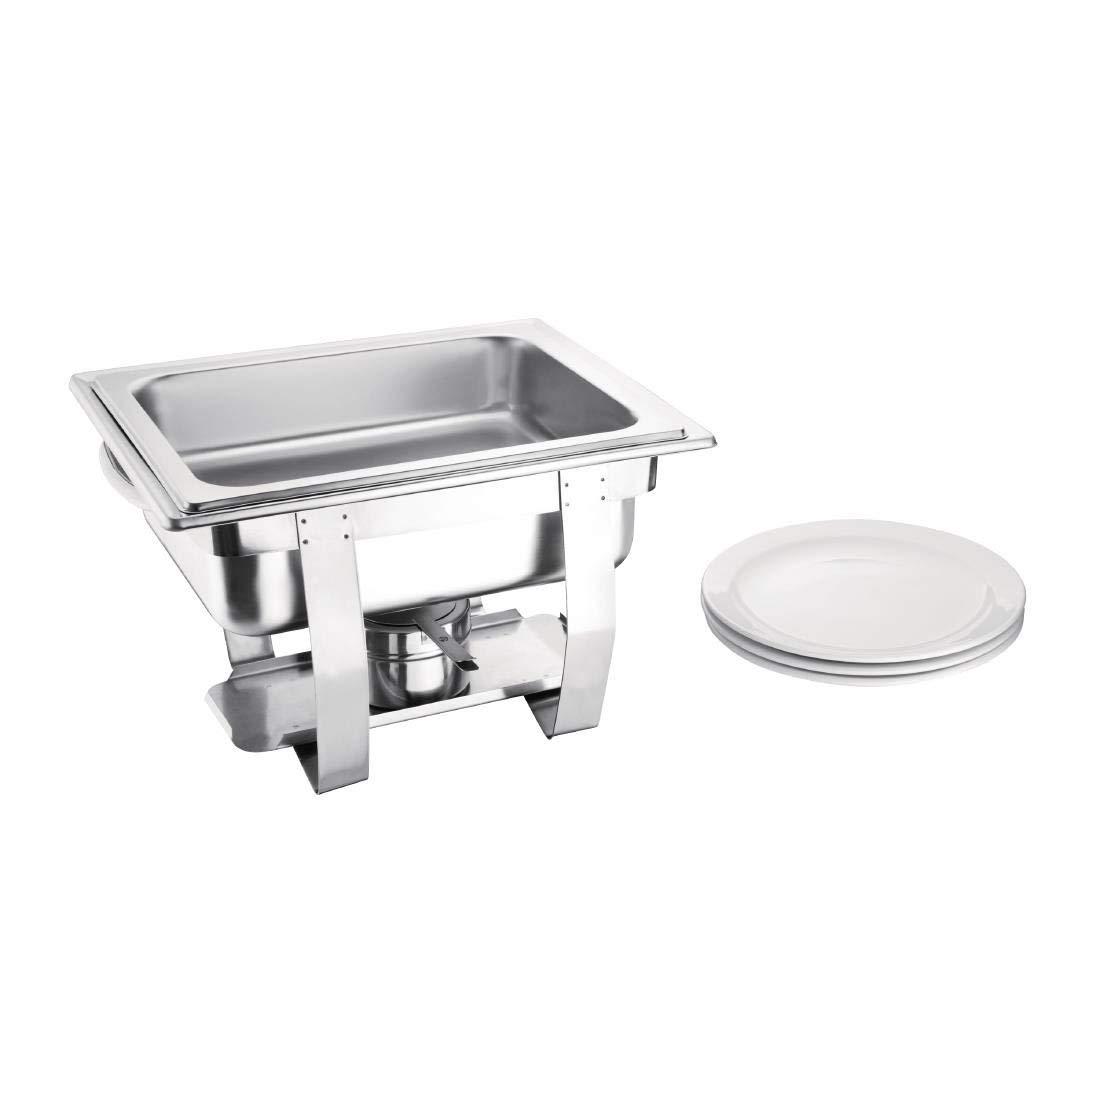 CN607 Olympia Milan Chafing Dish